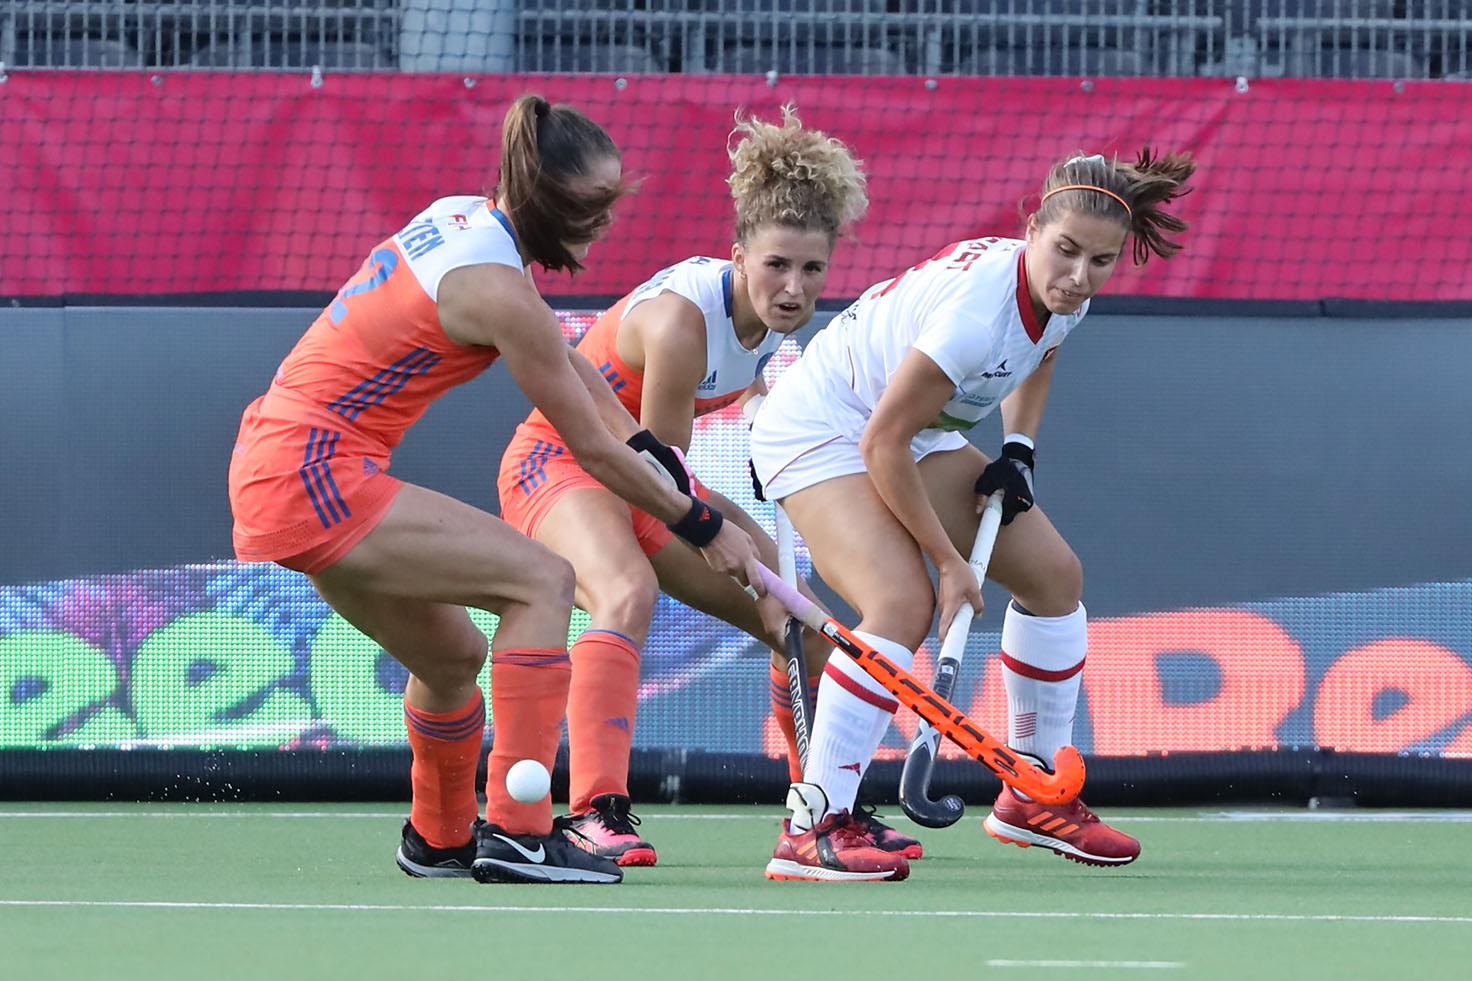 Campeonato de Europa Amberes (Belgica) - Selección Española Absoluta de Hockey Hierba